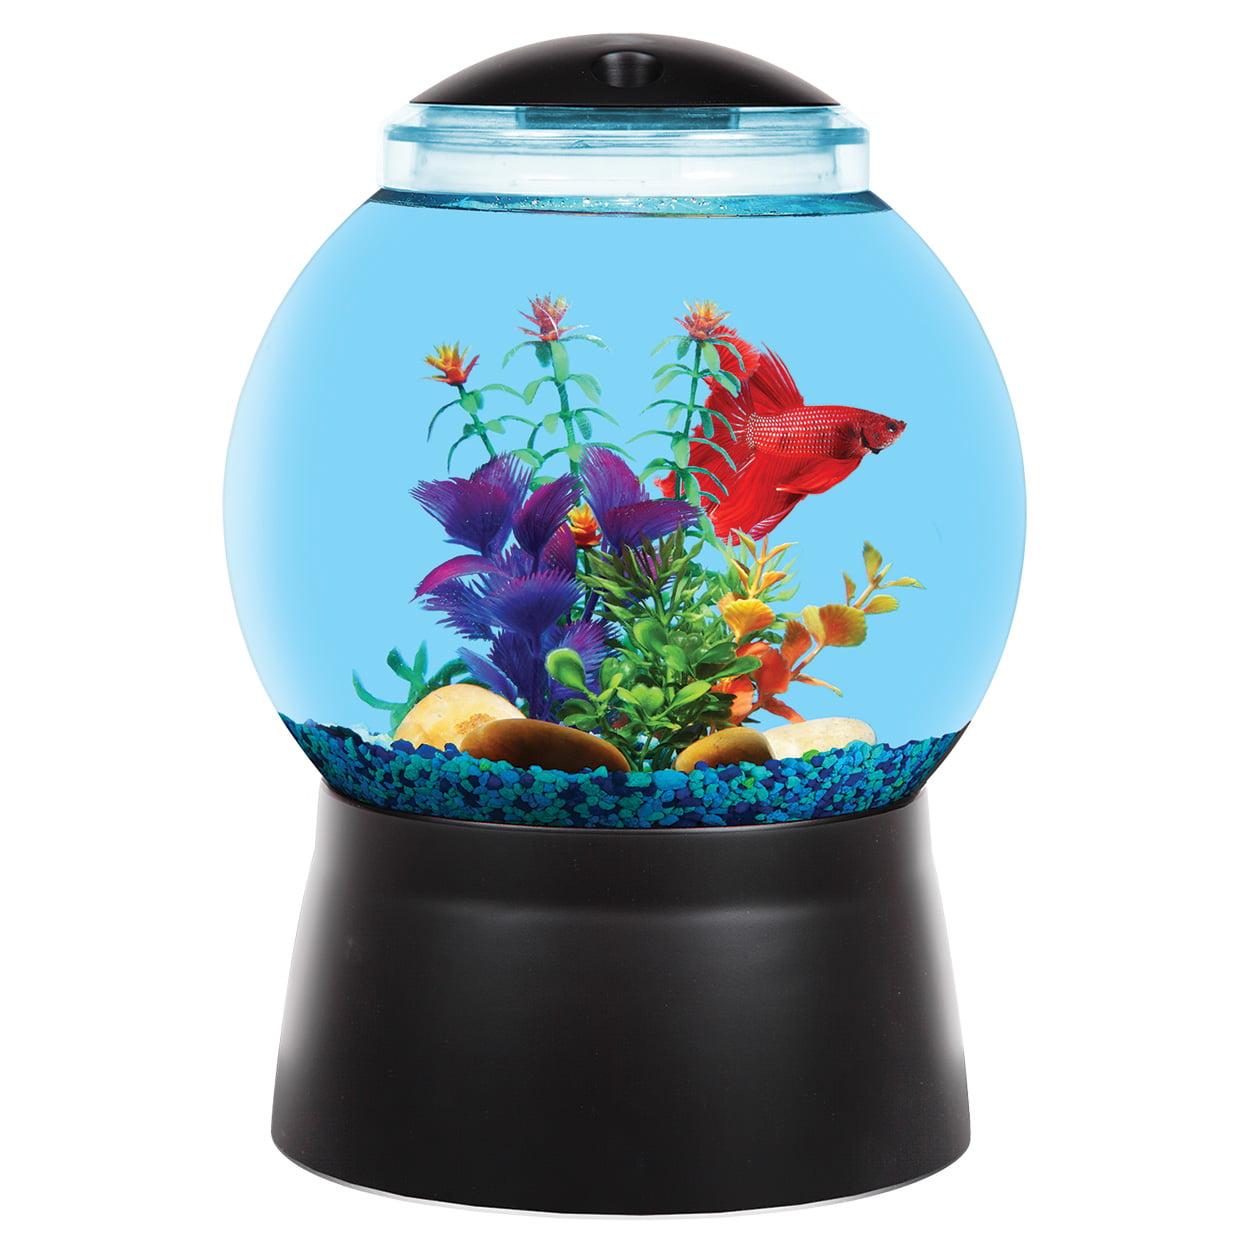 API Betta Gumball Aquarium Kit 2 gal by